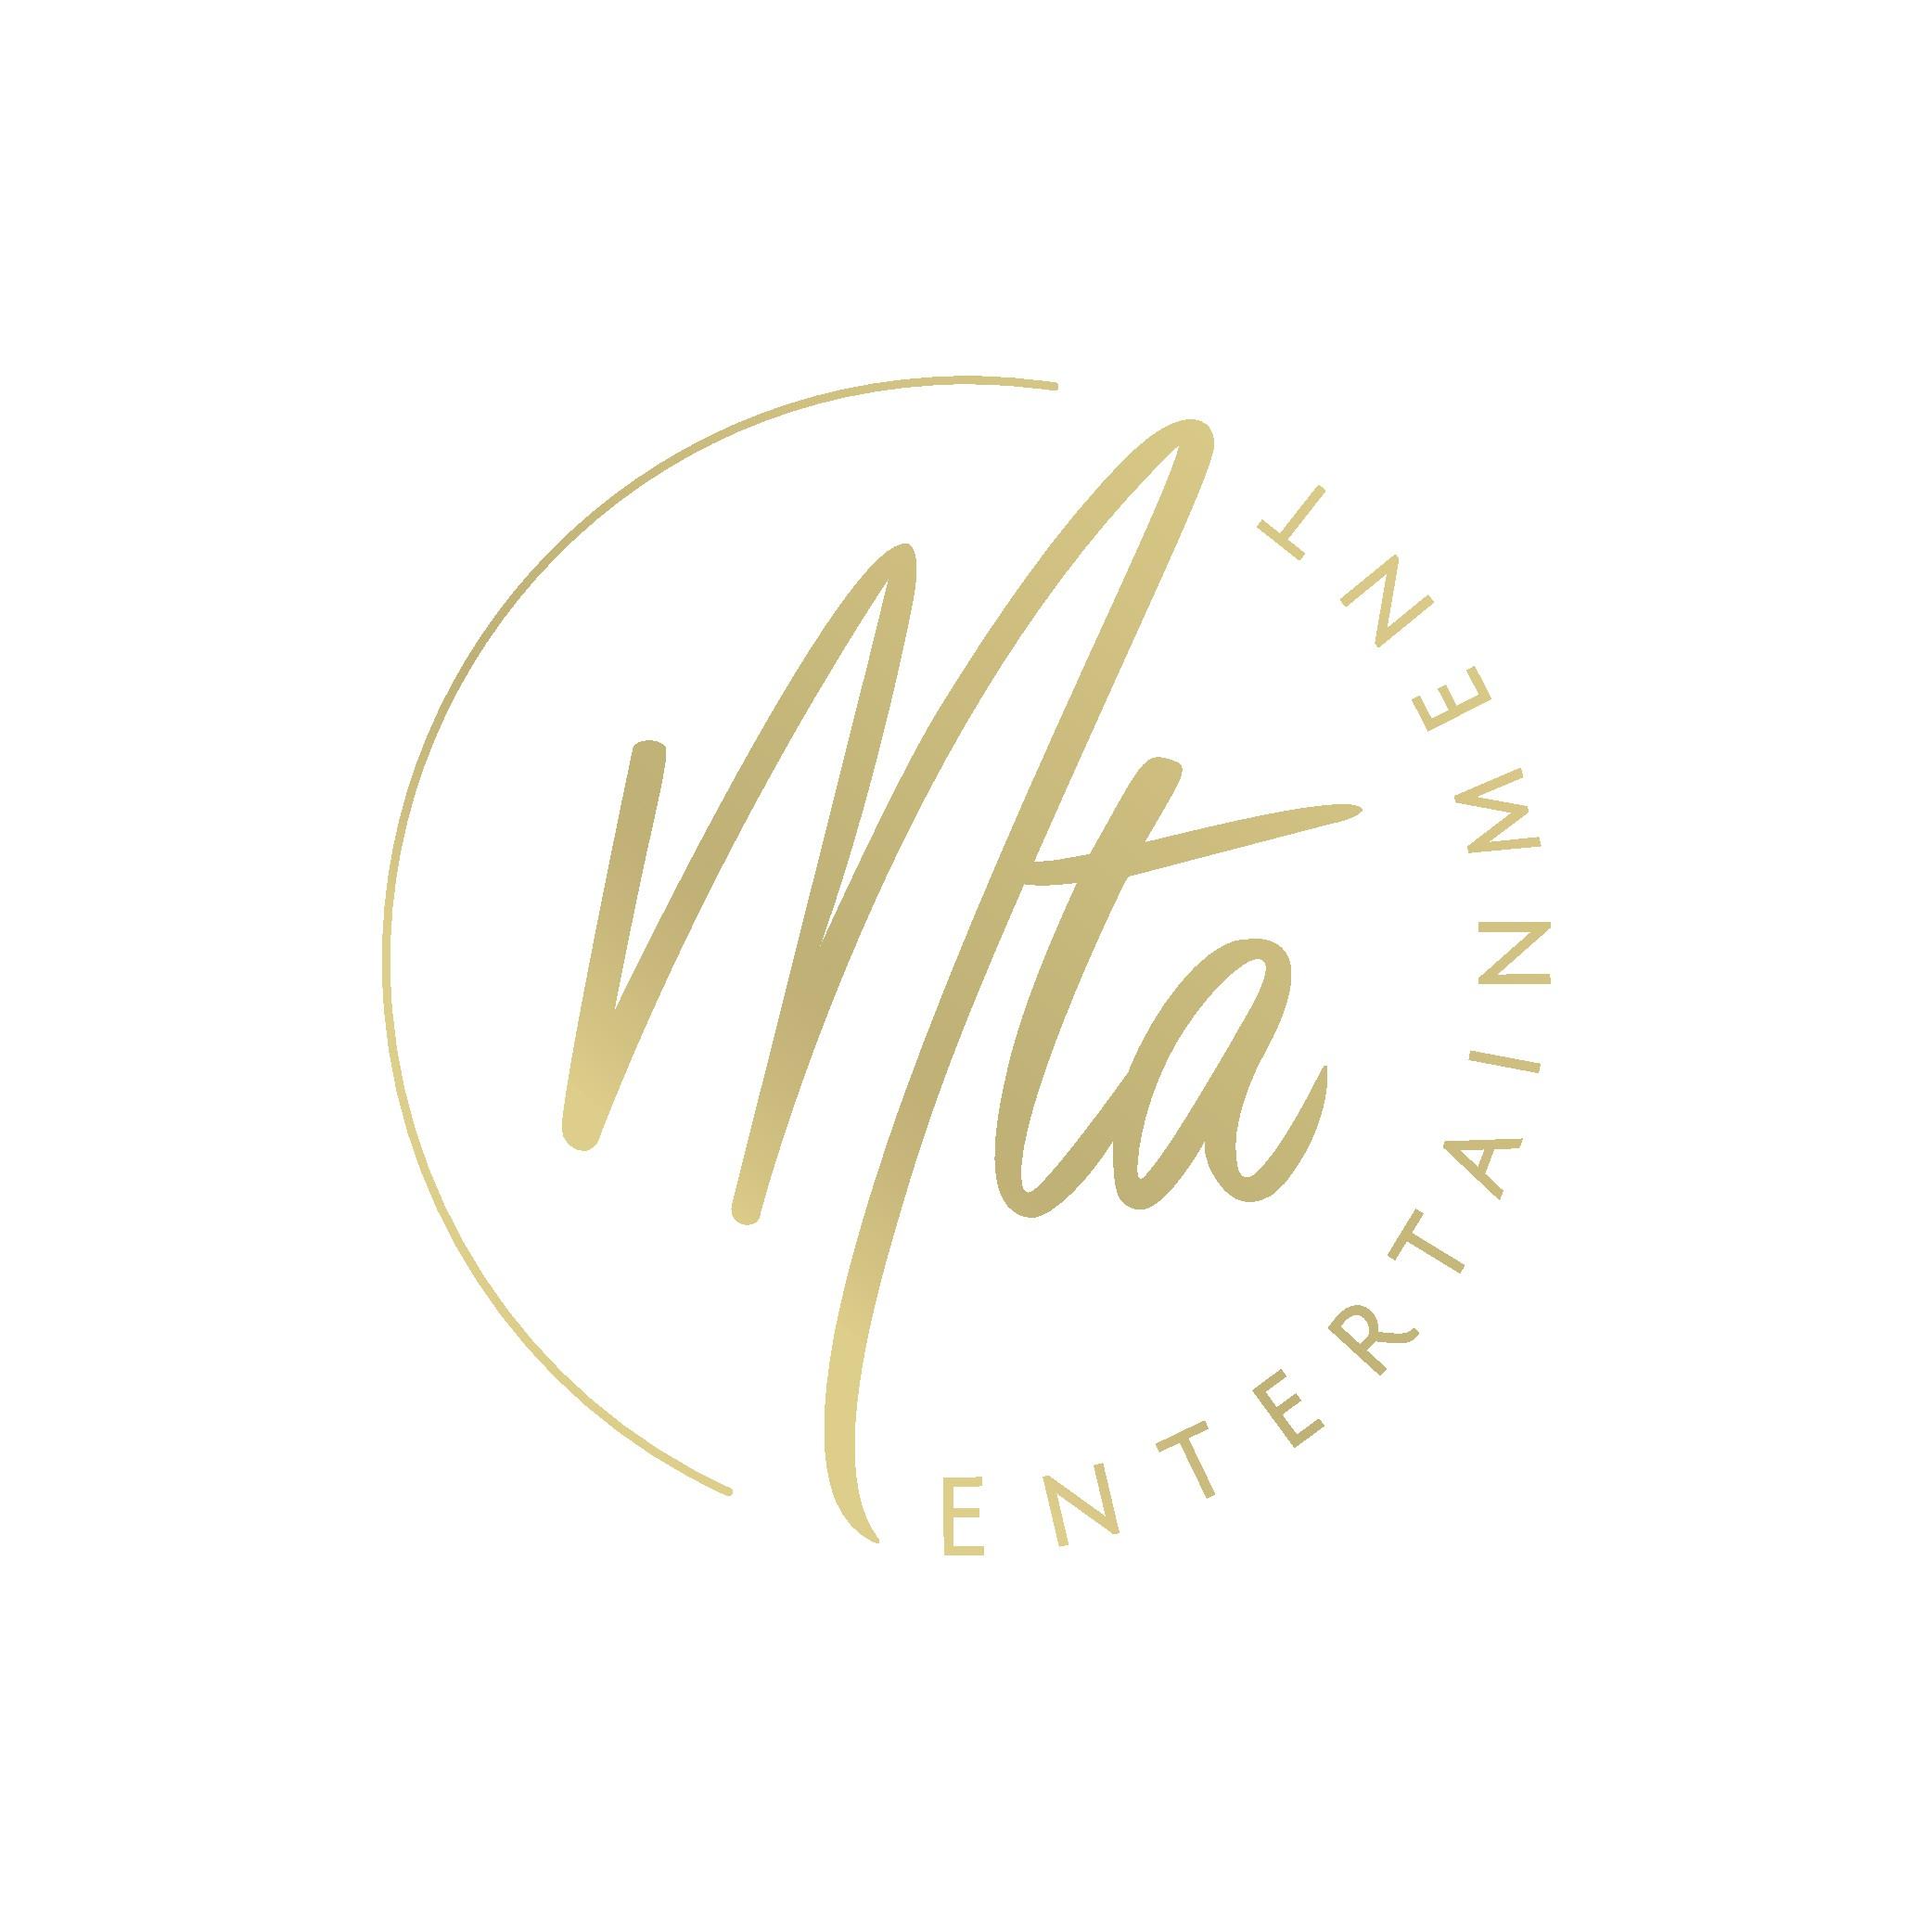 Design a beautiful logo for an Entertainment Company